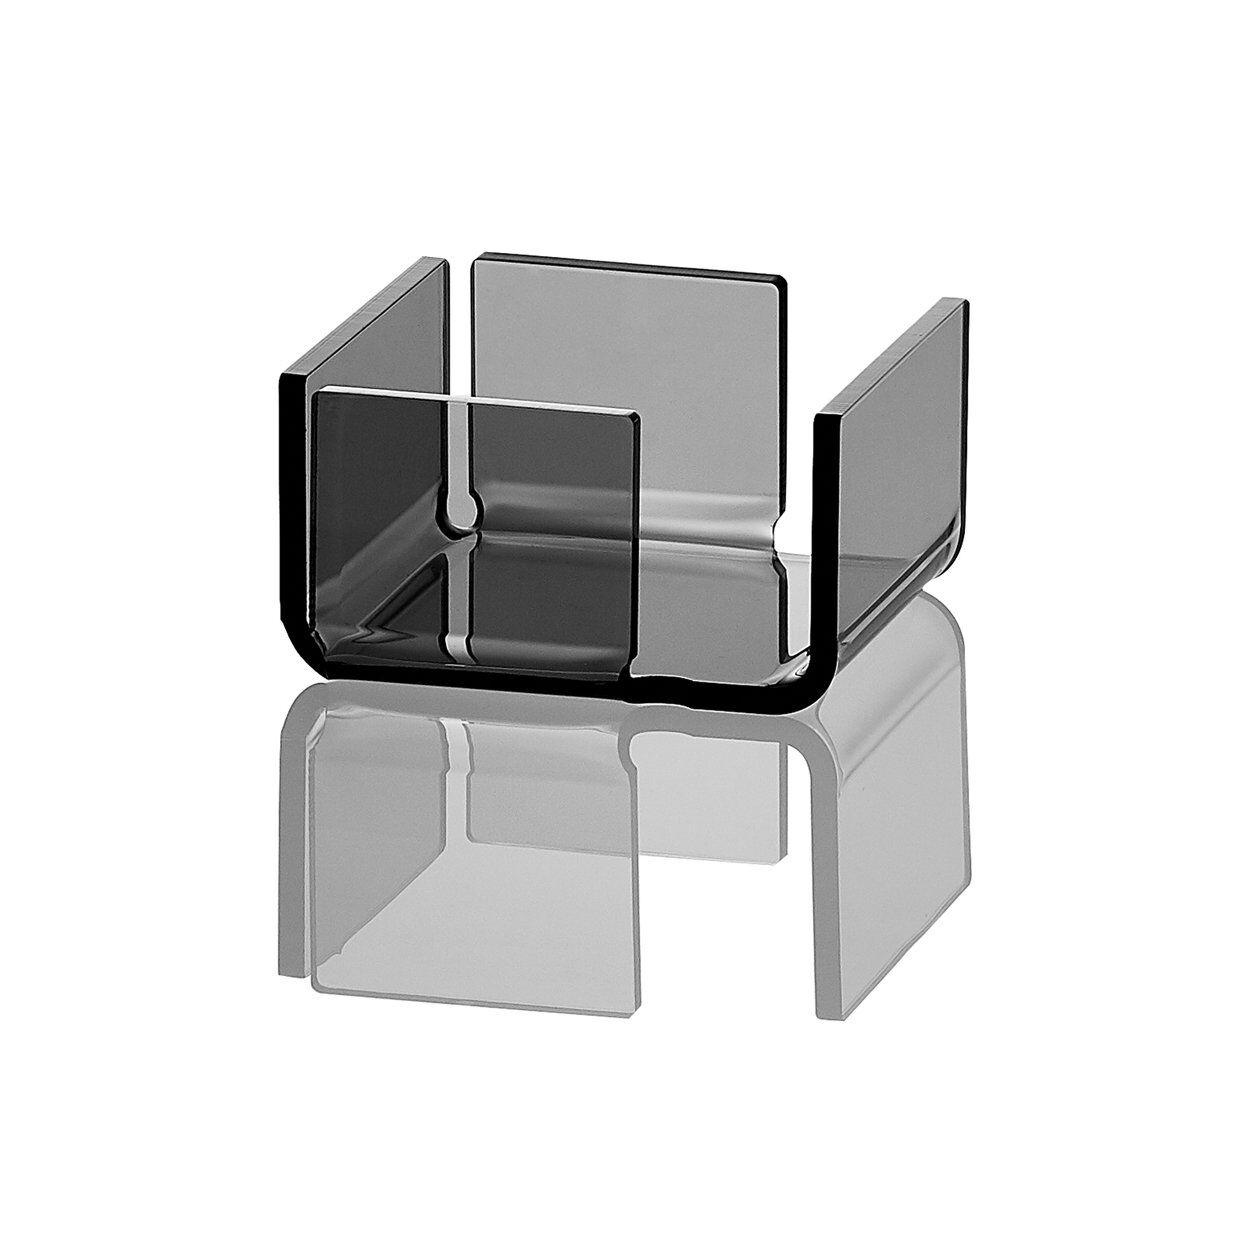 INOXRIV Flash fumee 8 porta bustine zucchero / tovaglioli 10,4x9,9